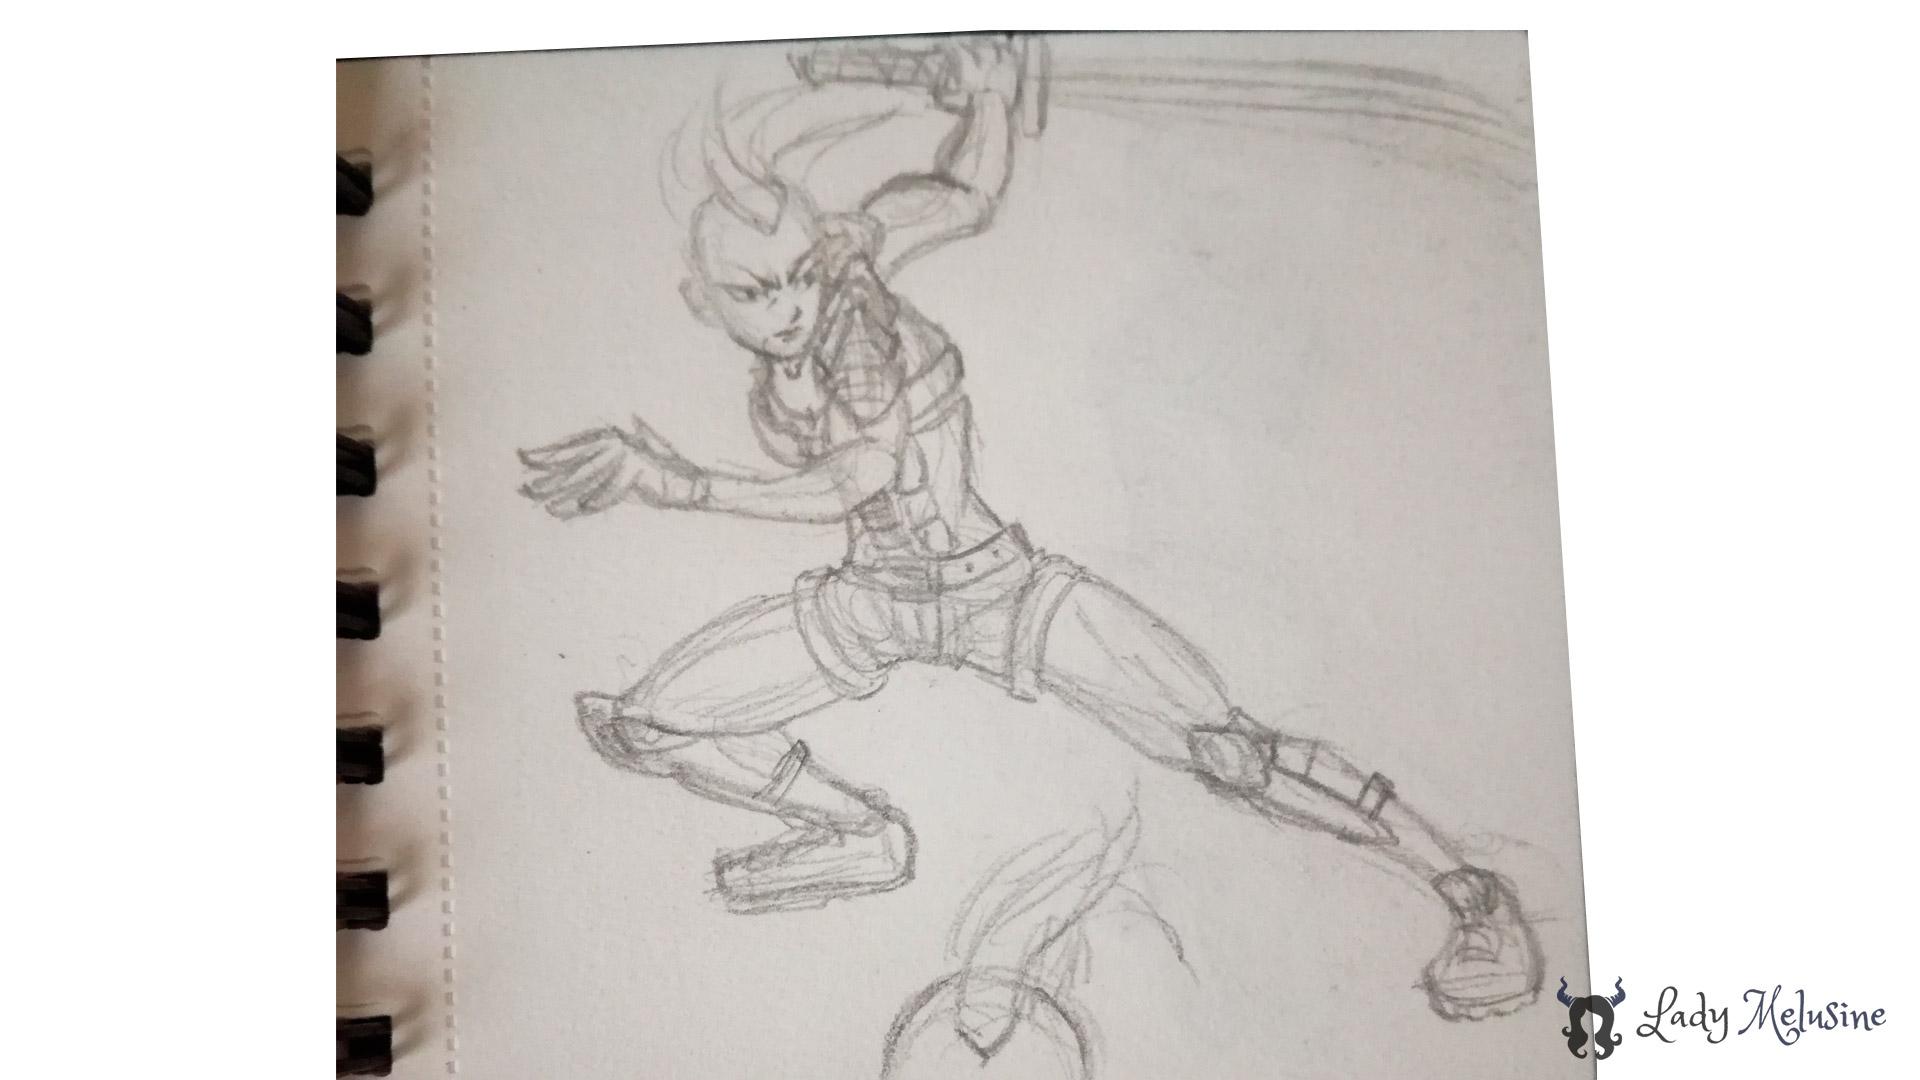 Digital Painting Warrior 00 Lady Melusine